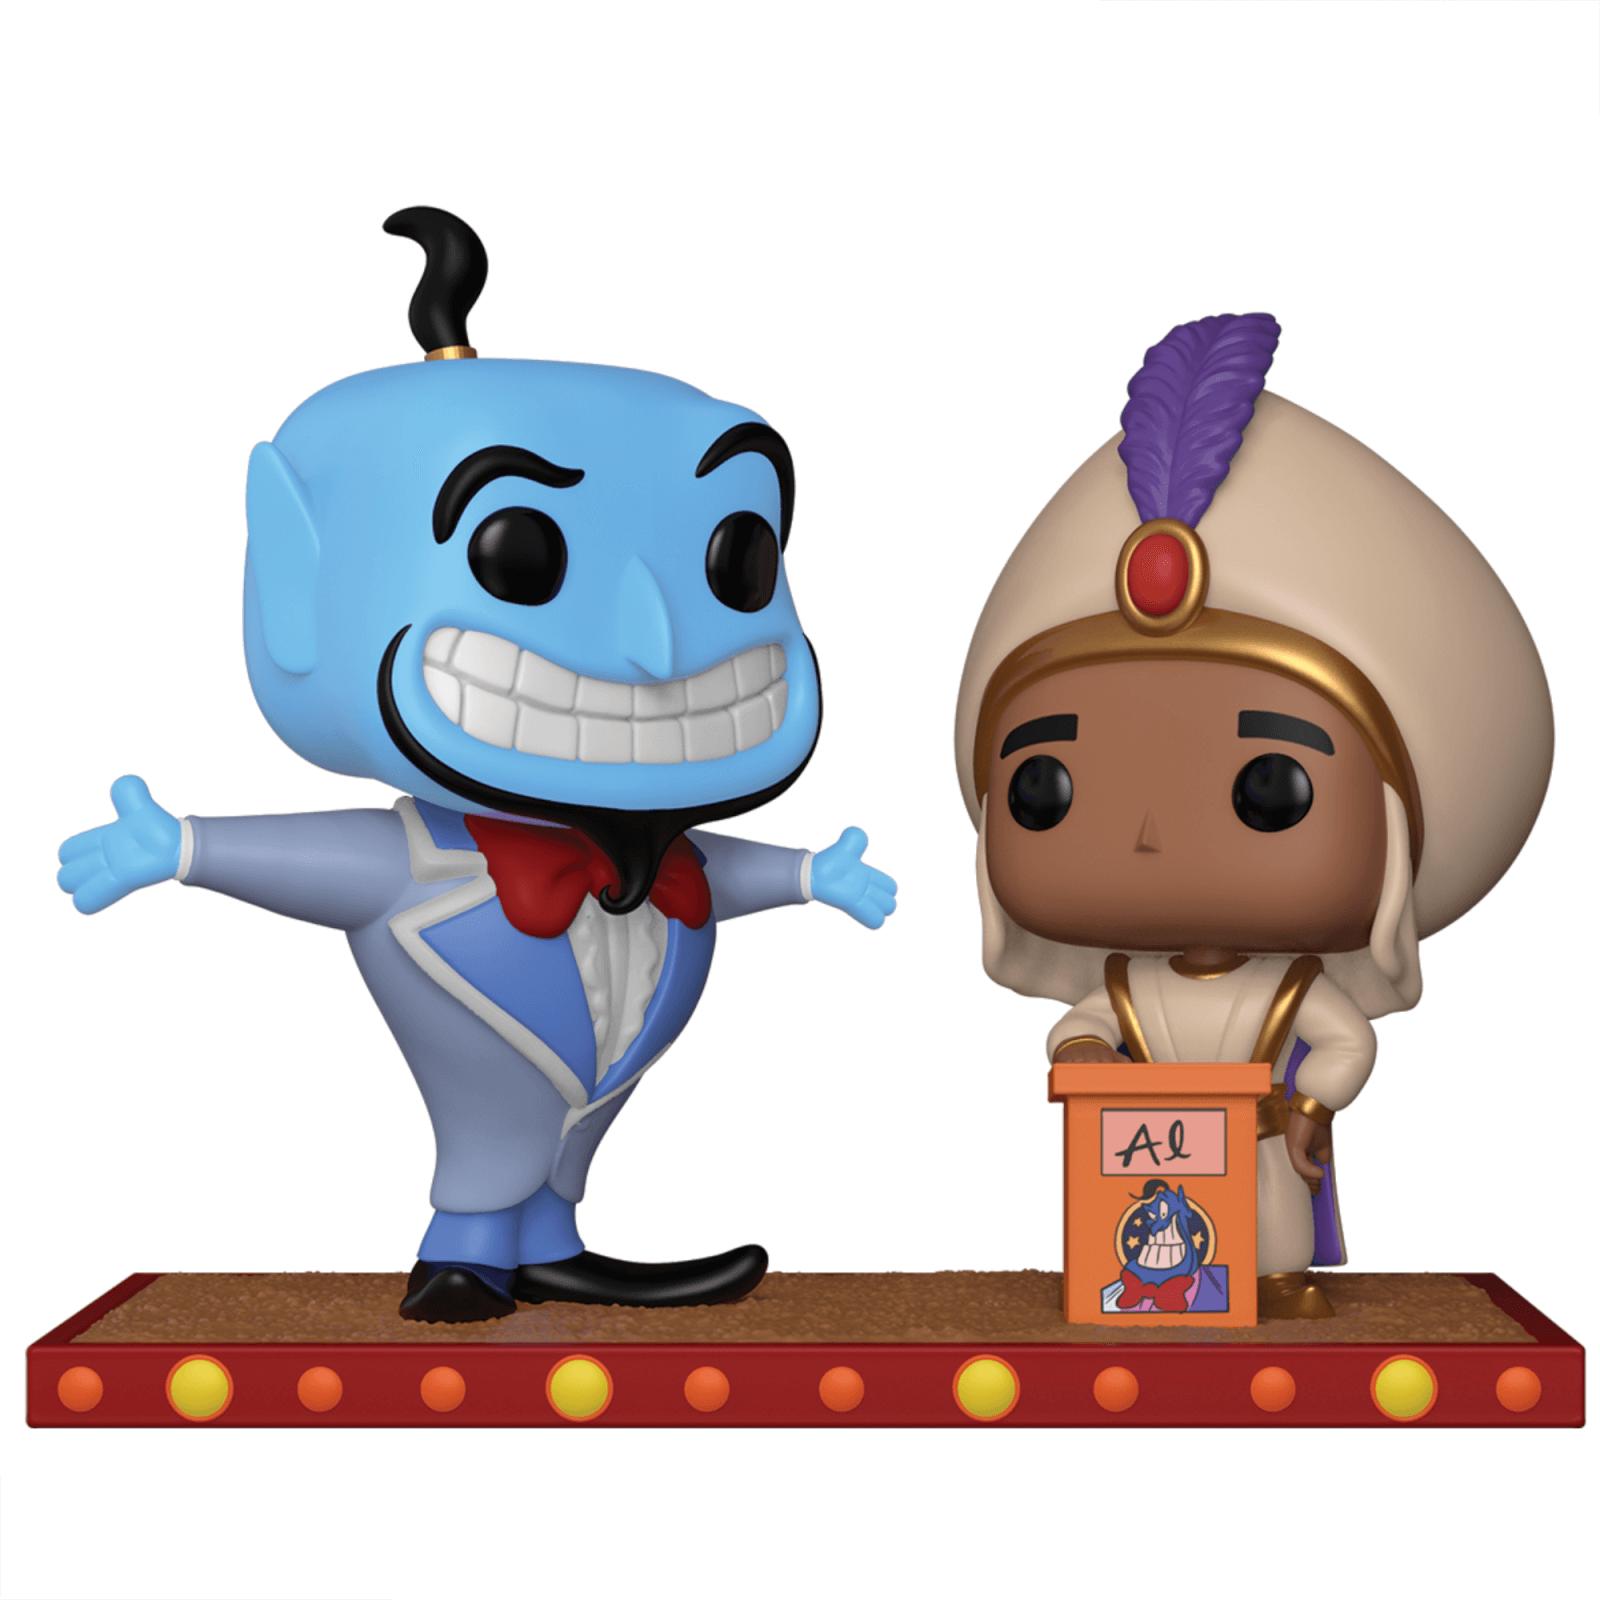 Aladdin Genie Pop Movie Moment Pop In A Box Uk